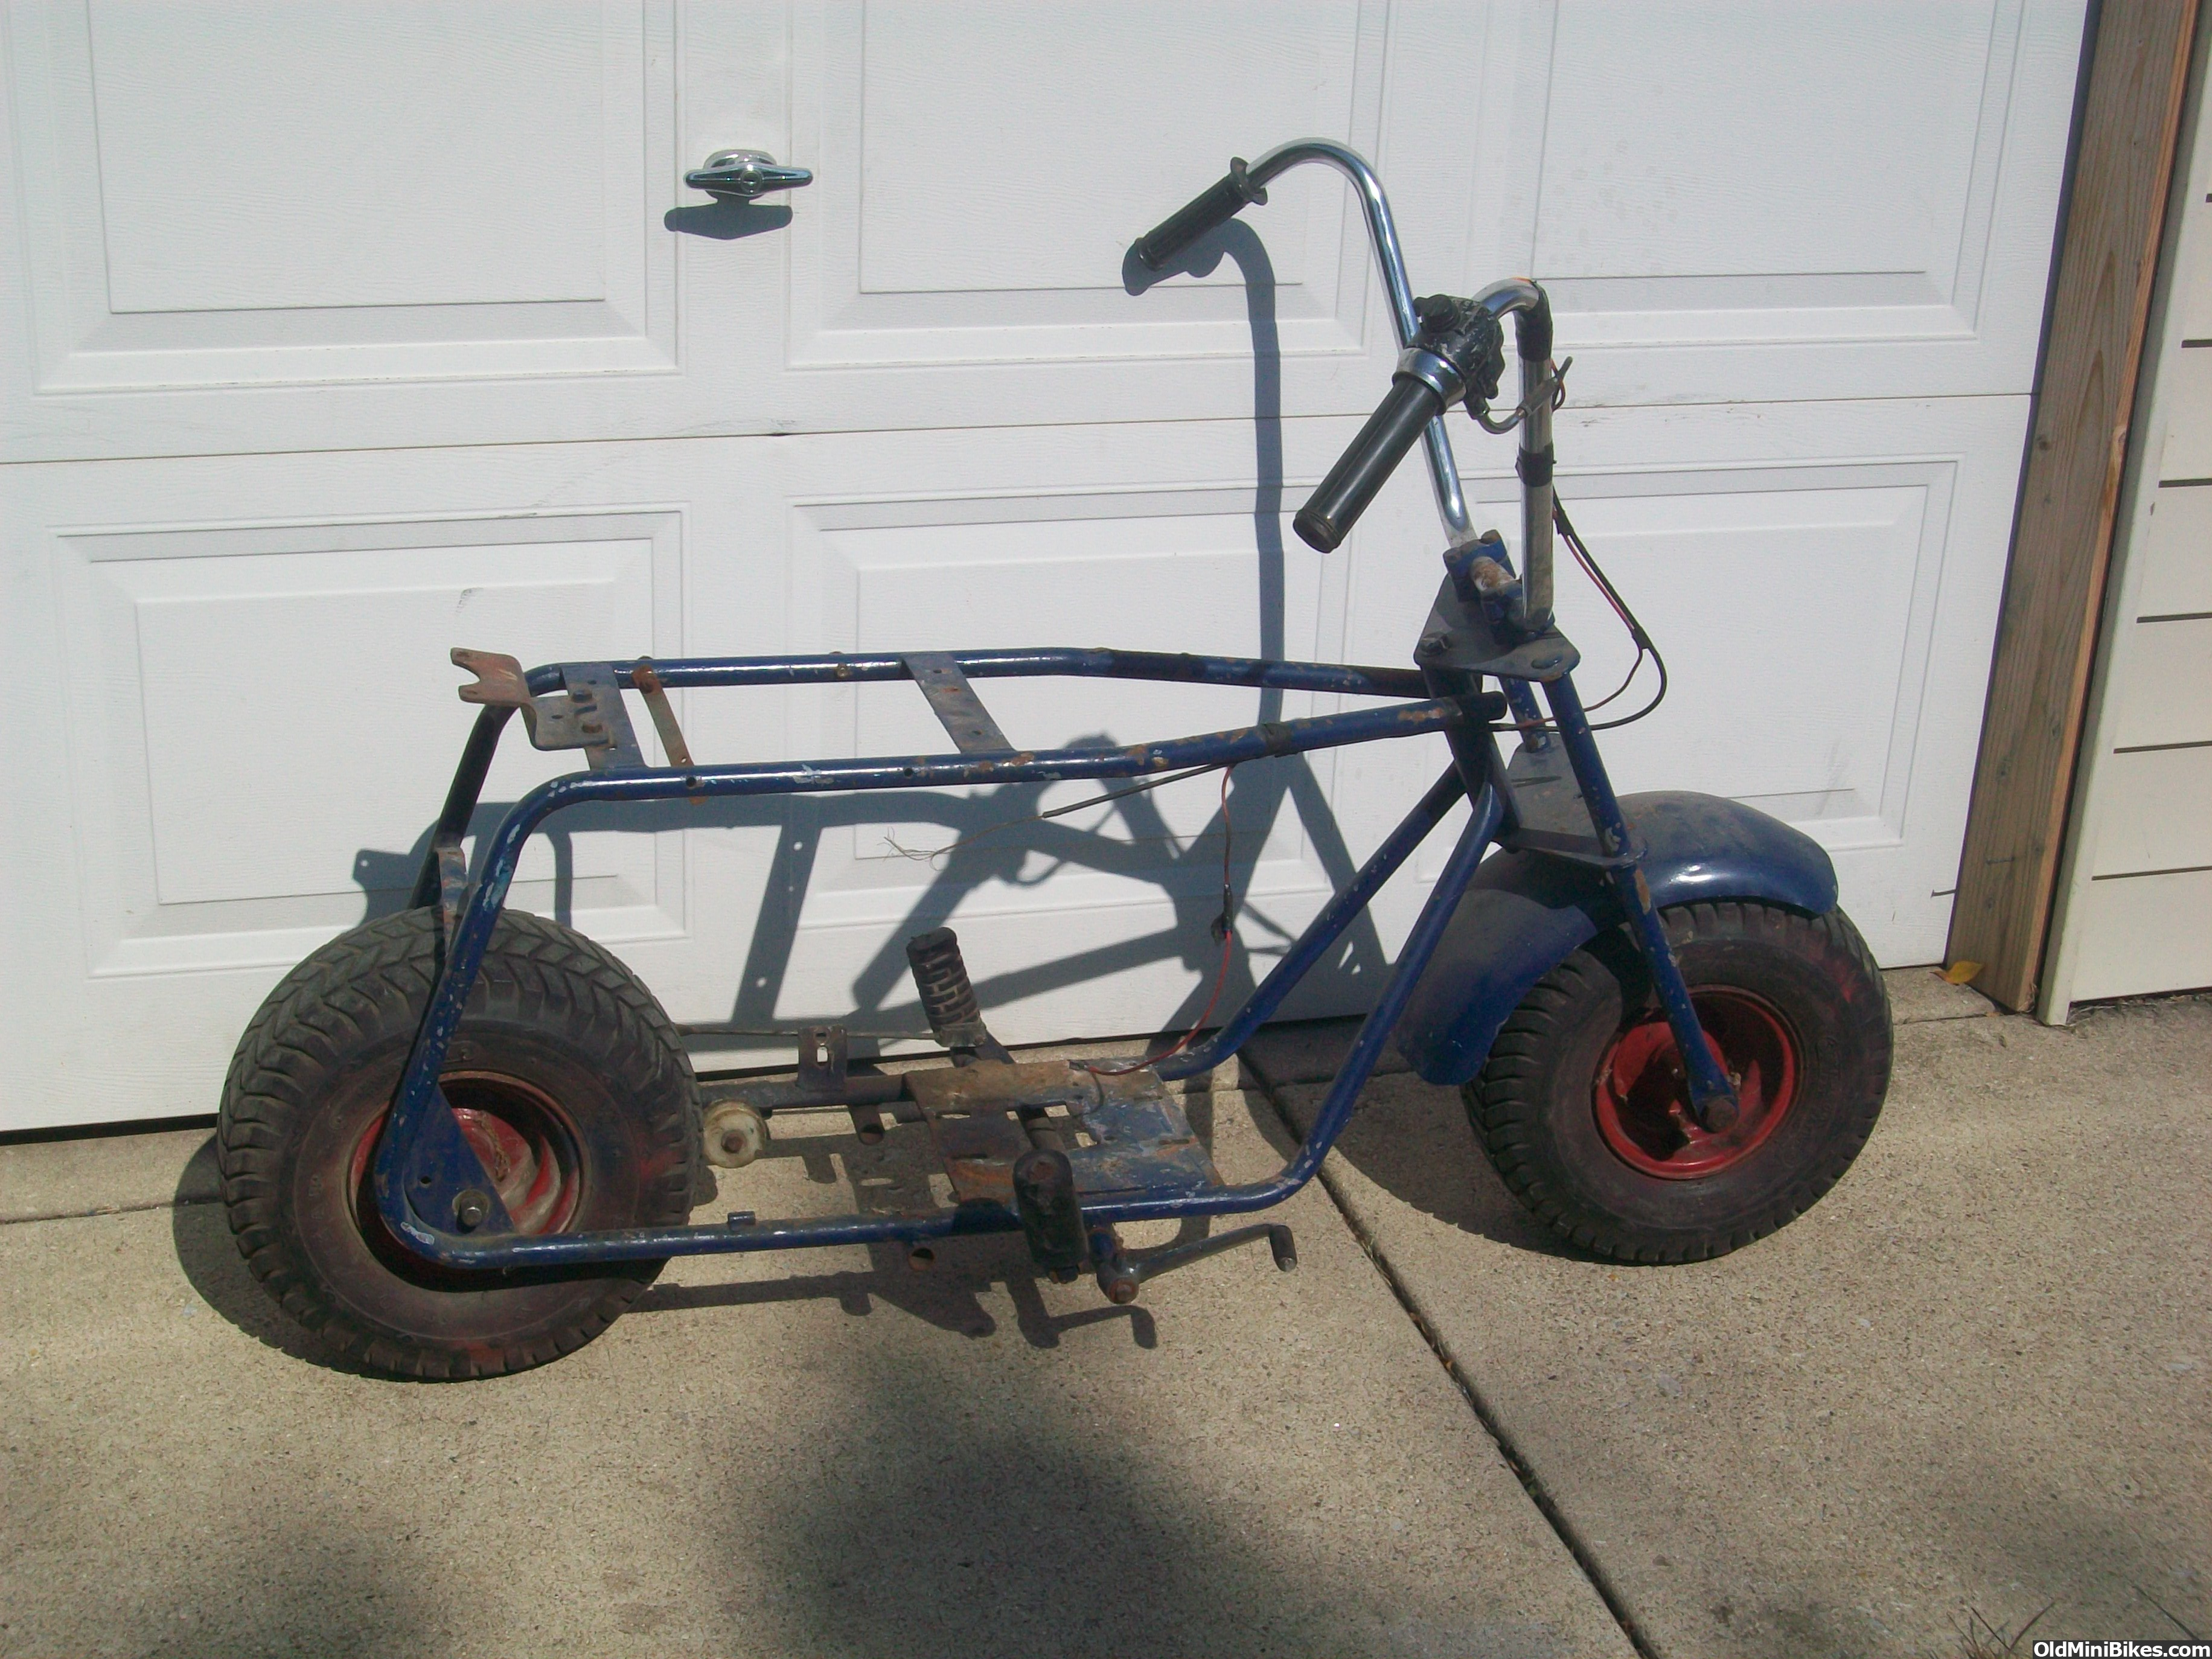 Pack Mule Mini Bike : Harrison wildcat roller will ship